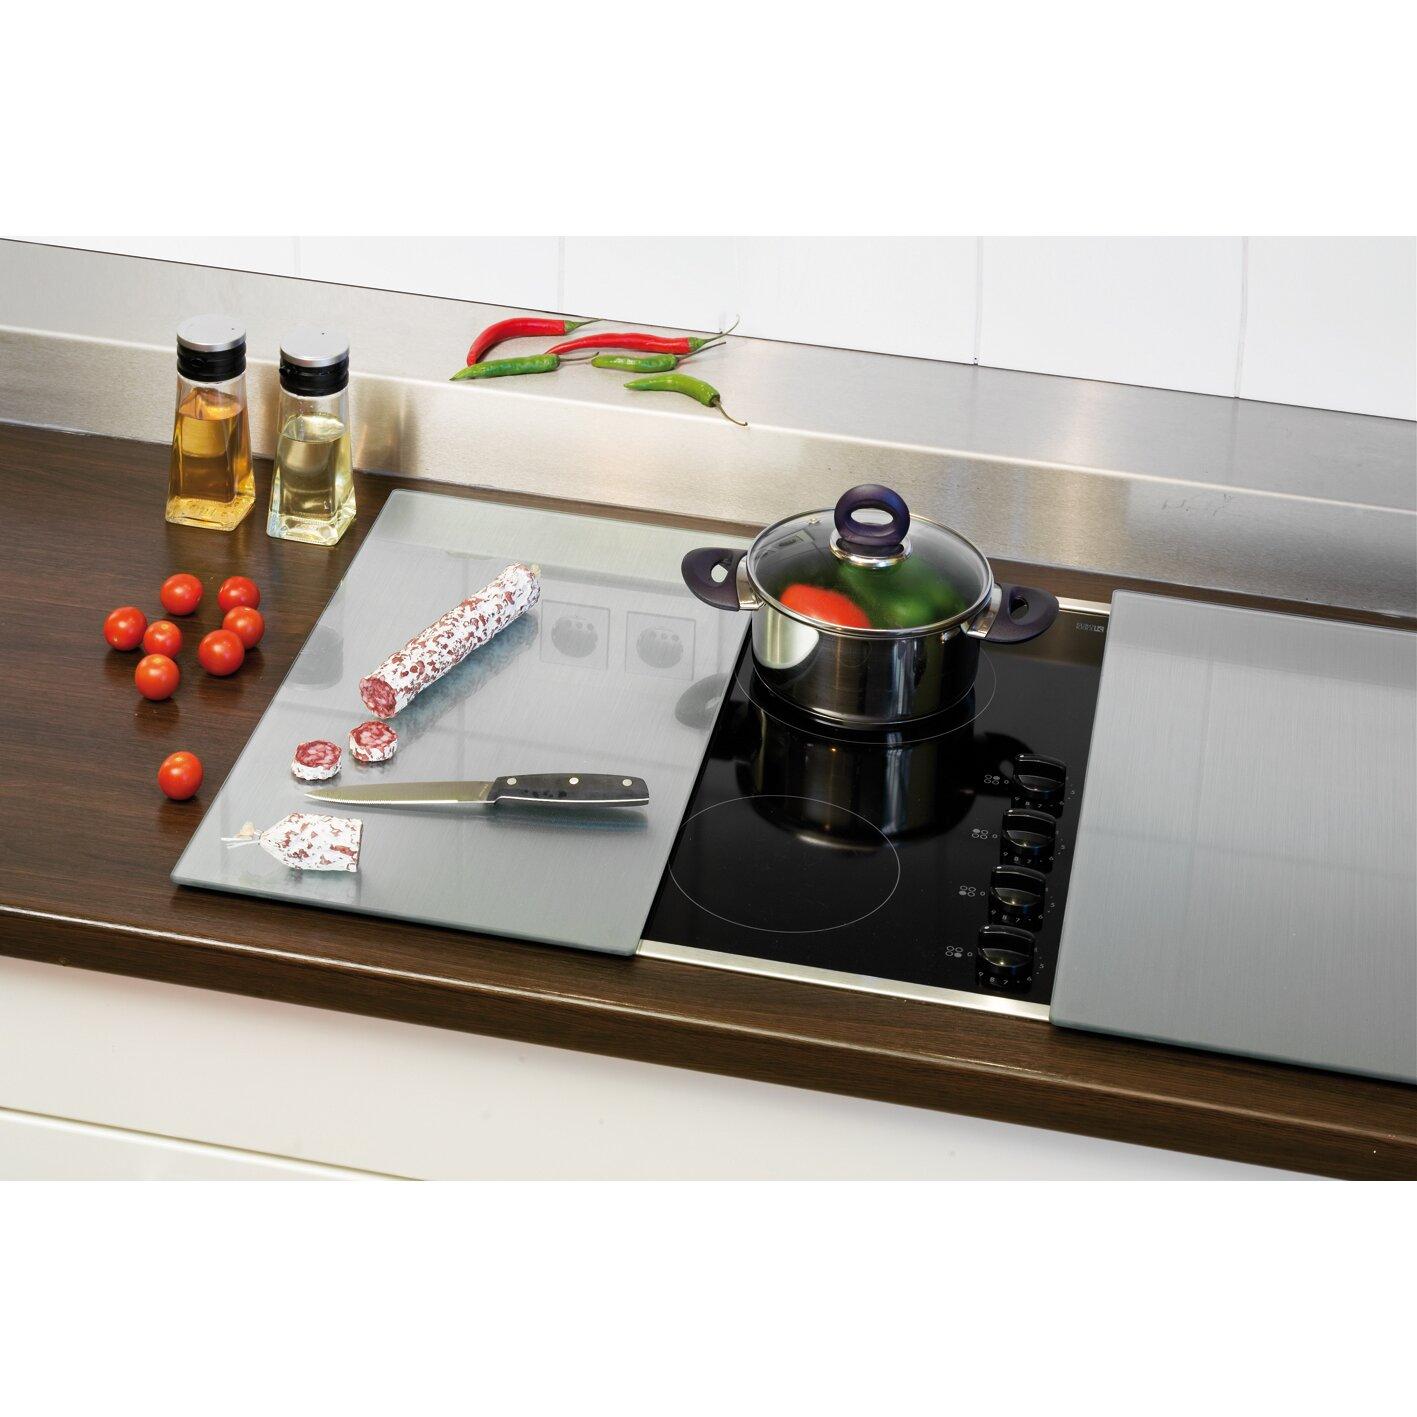 zeller 2 tlg schneideplatten set opak f r cerankochfeld. Black Bedroom Furniture Sets. Home Design Ideas